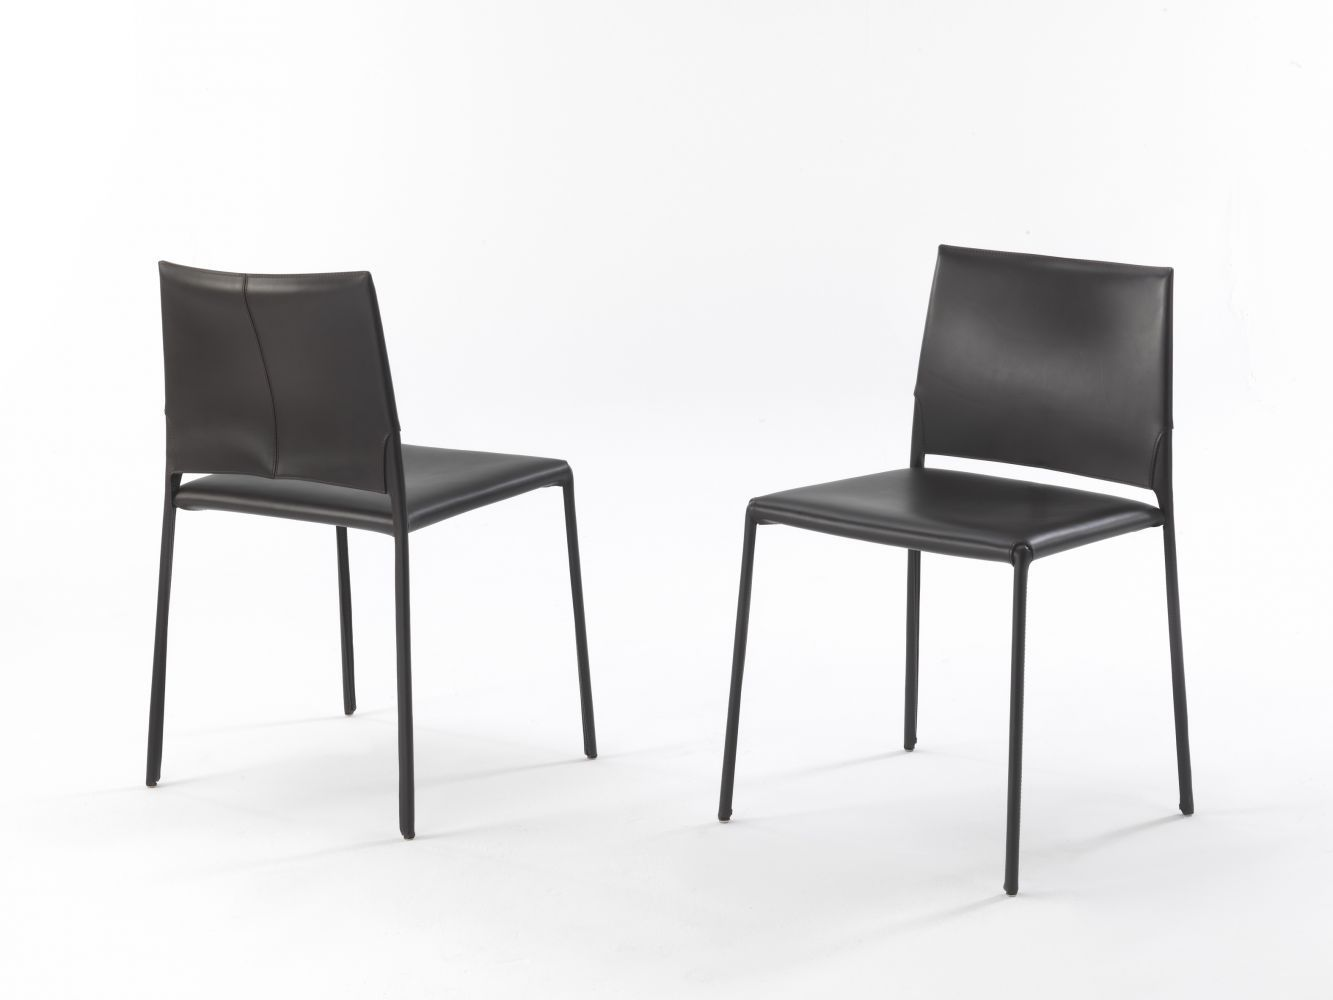 Moderner Stuhl Metall Leder Von Claudio Bellini Kau